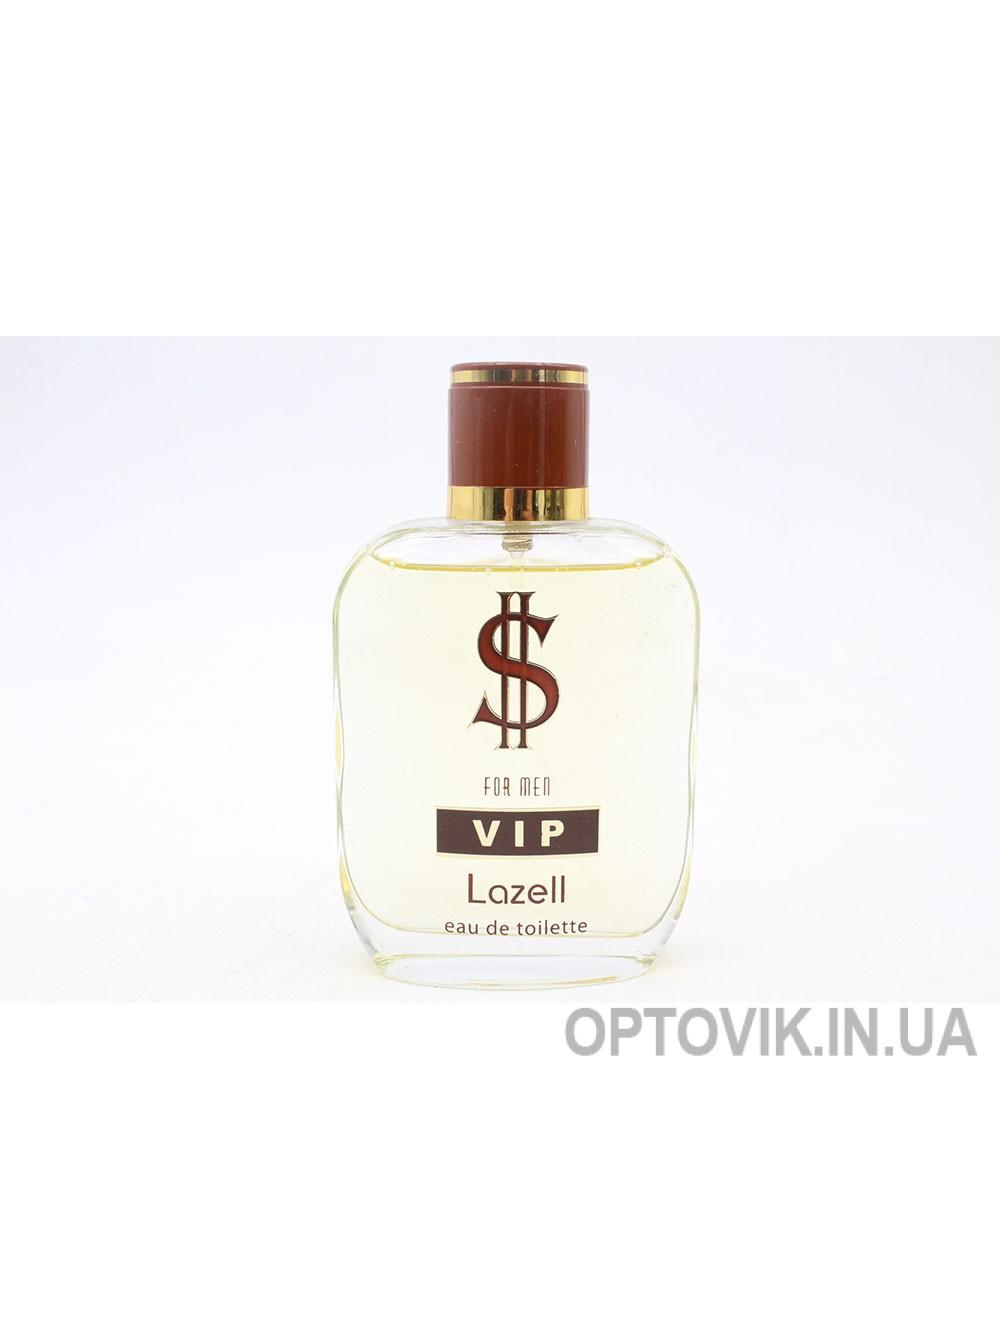 Мужской парфюм тестер: La-111-110 100мл